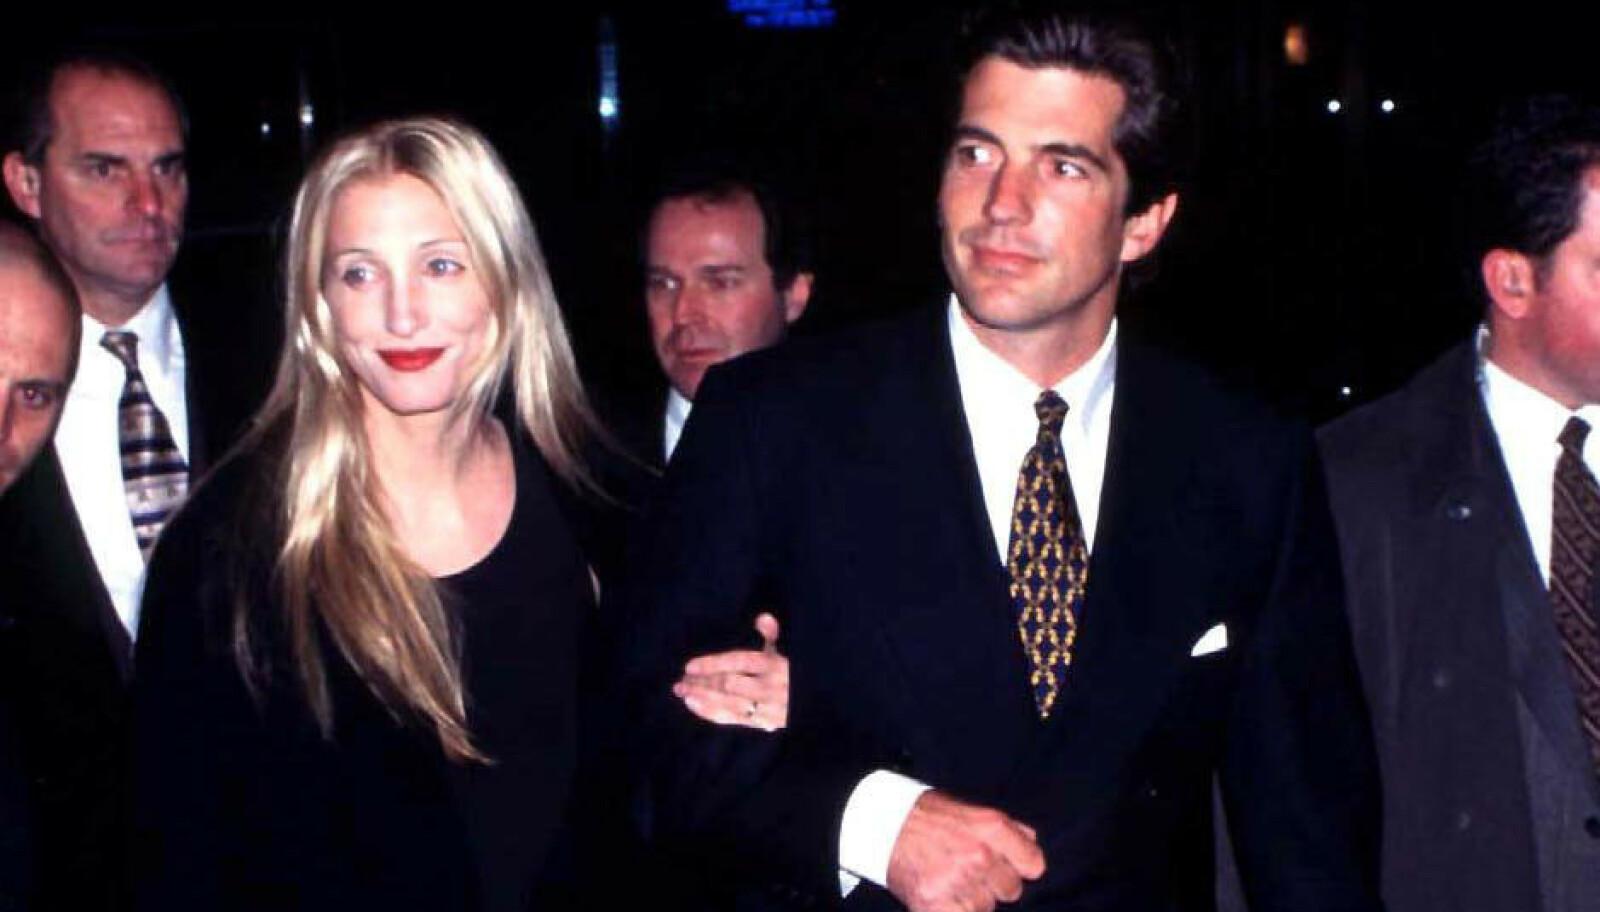 JFK JR. OG CAROLYN BESSETTE: De ble regnet for å være 90-tallets hotteste par. Så styrtet småflyet han flydde Dette bildet er fra 1999. Foto: Araldo Di Crollalanza / REX / NTB